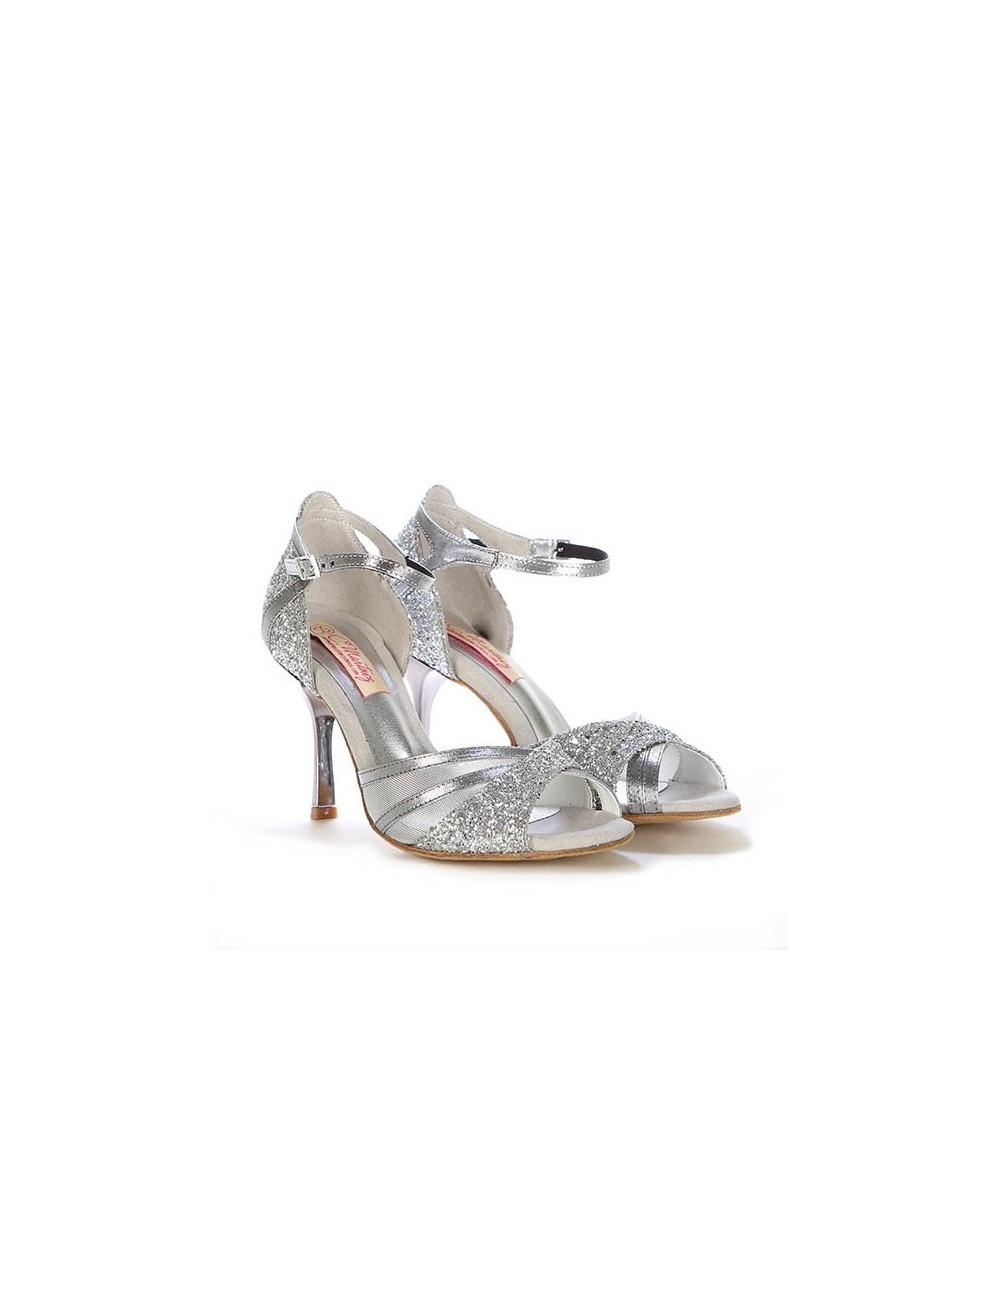 De Plata Zapatos Brillantes Latino Baile WBoxCQrde